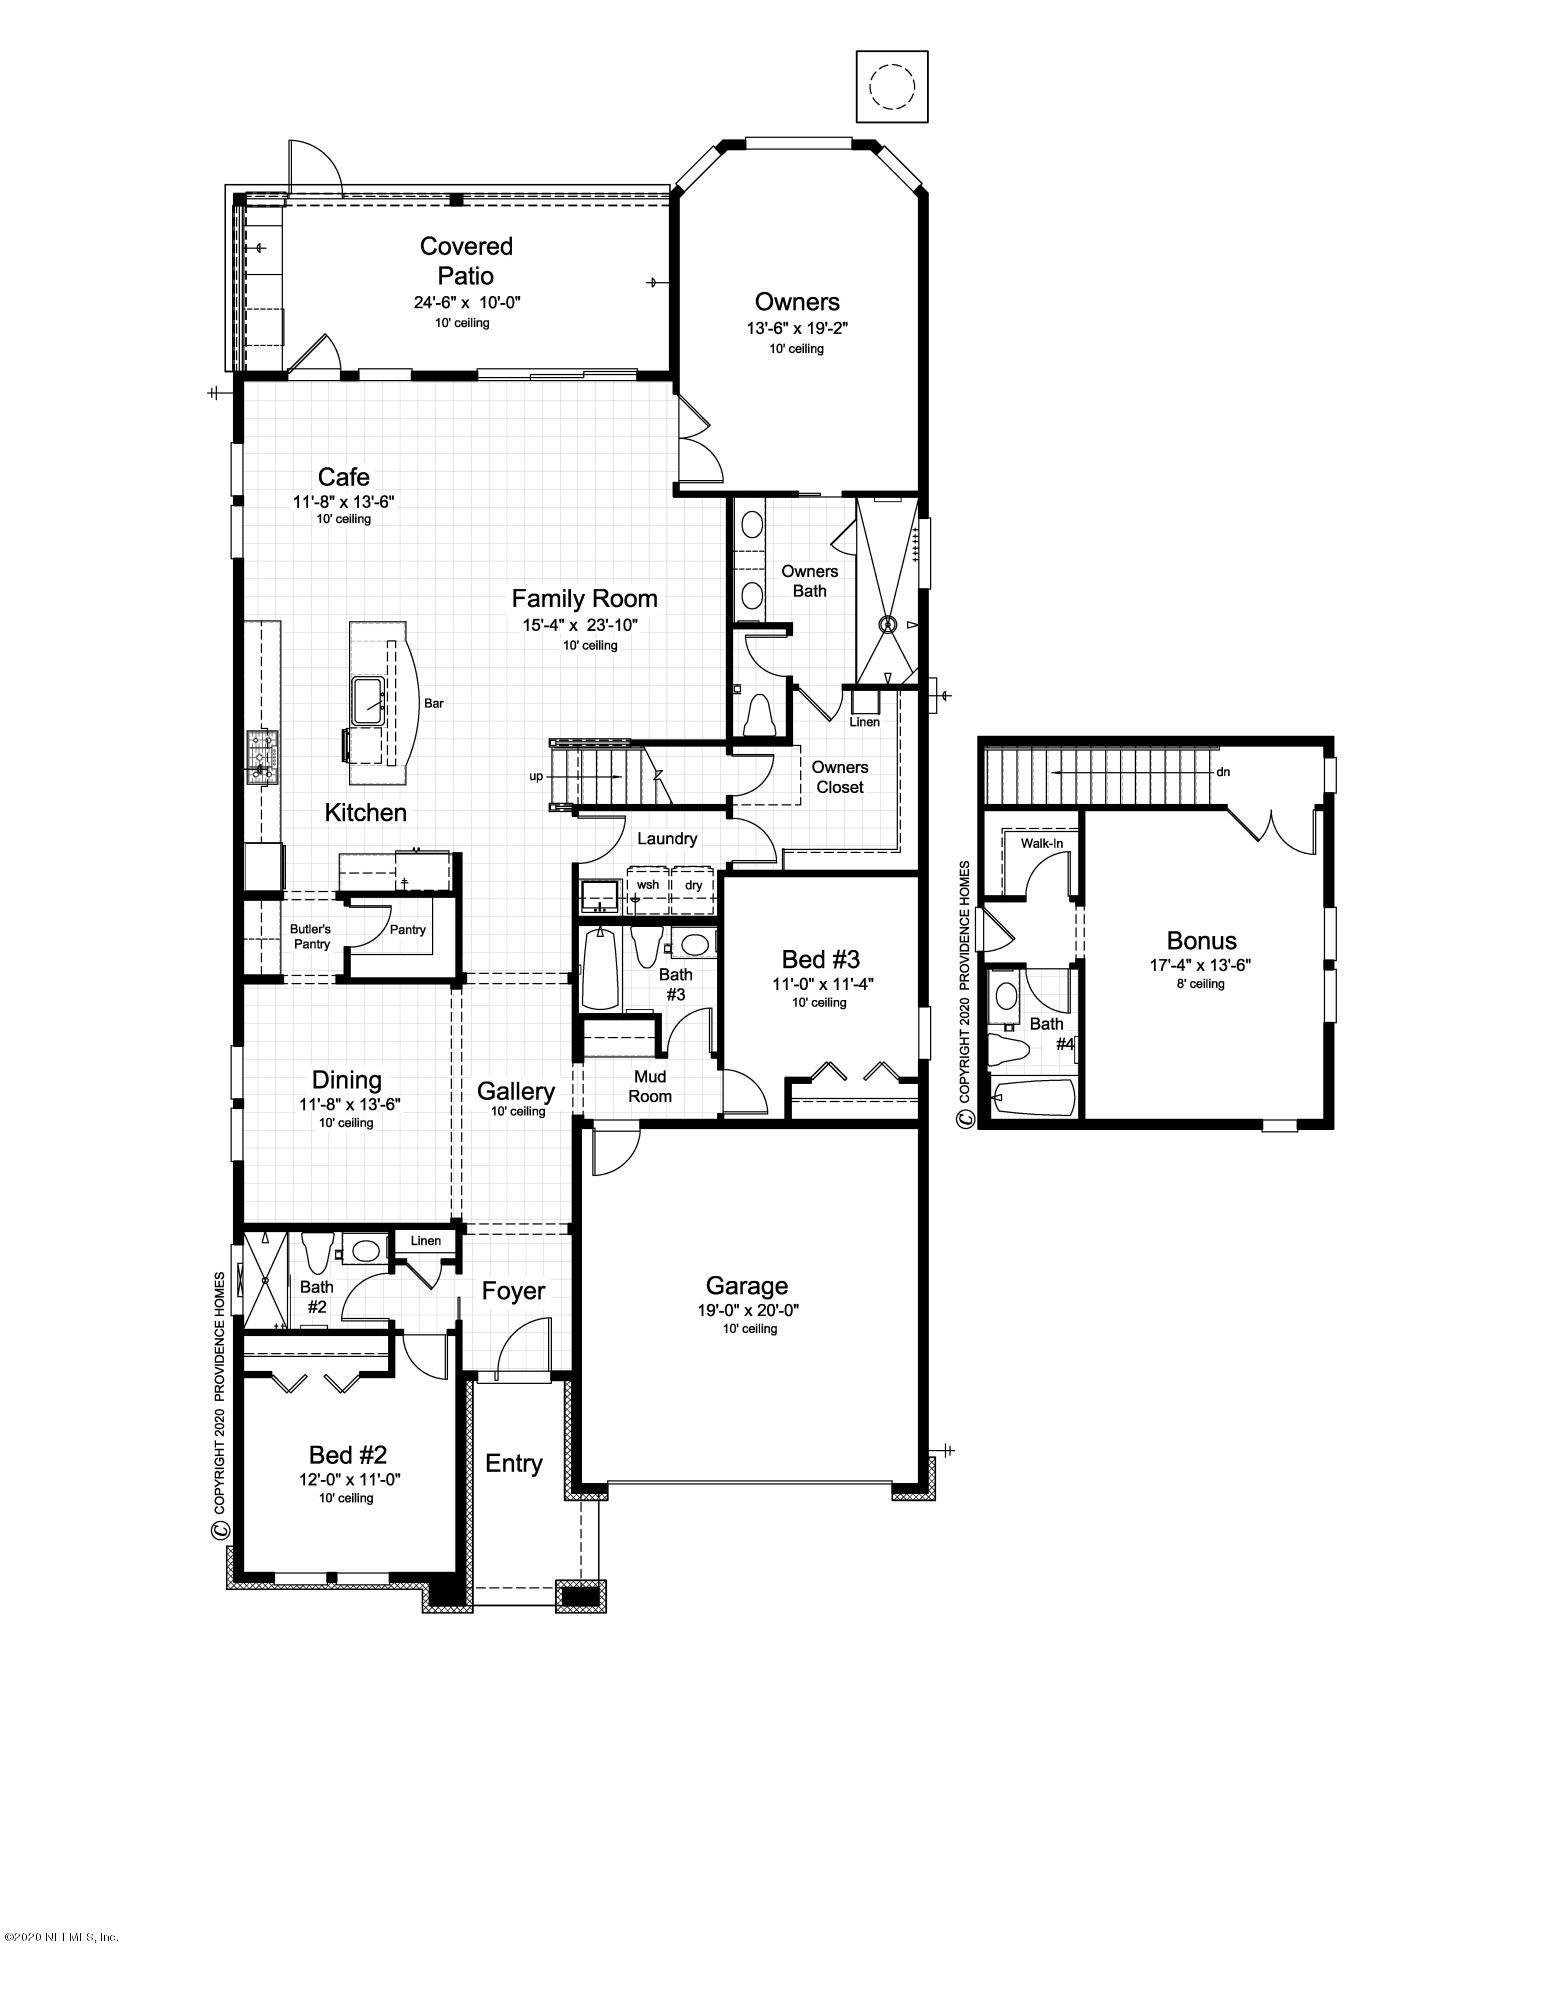 234 PIONEER VILLAGE, PONTE VEDRA, FLORIDA 32081, 4 Bedrooms Bedrooms, ,4 BathroomsBathrooms,Residential,For sale,PIONEER VILLAGE,1068785